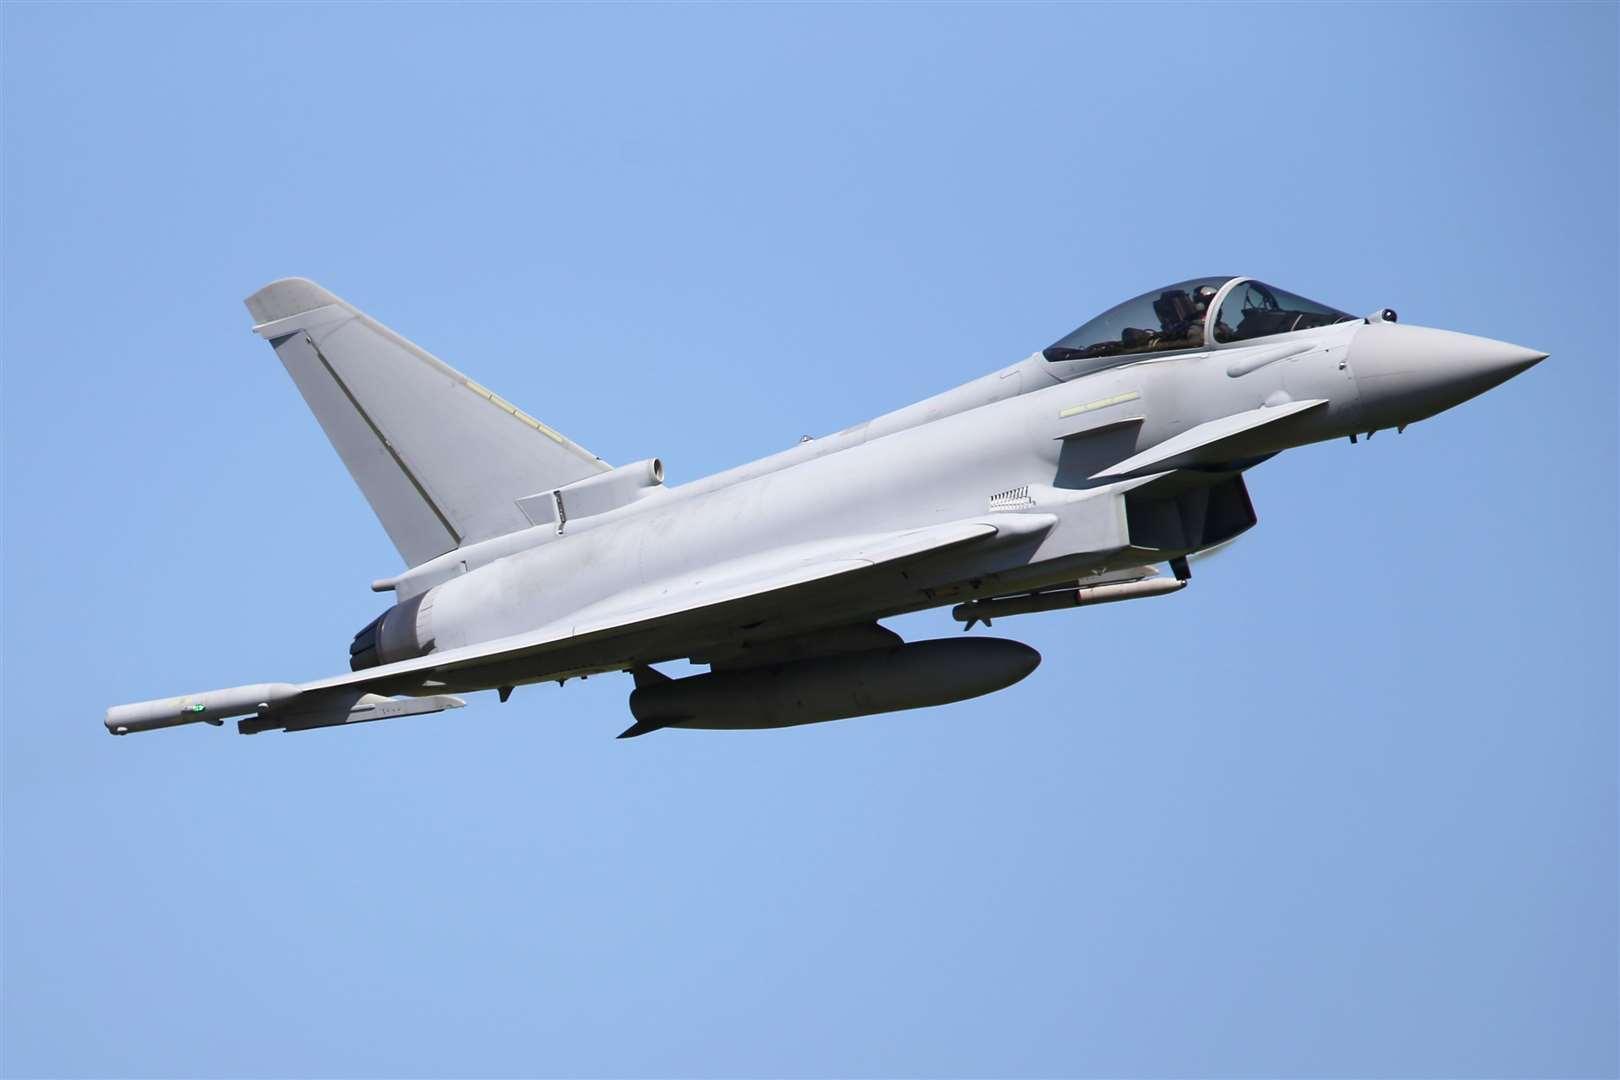 RAF fighter jets scramble to intercept a private plane over London